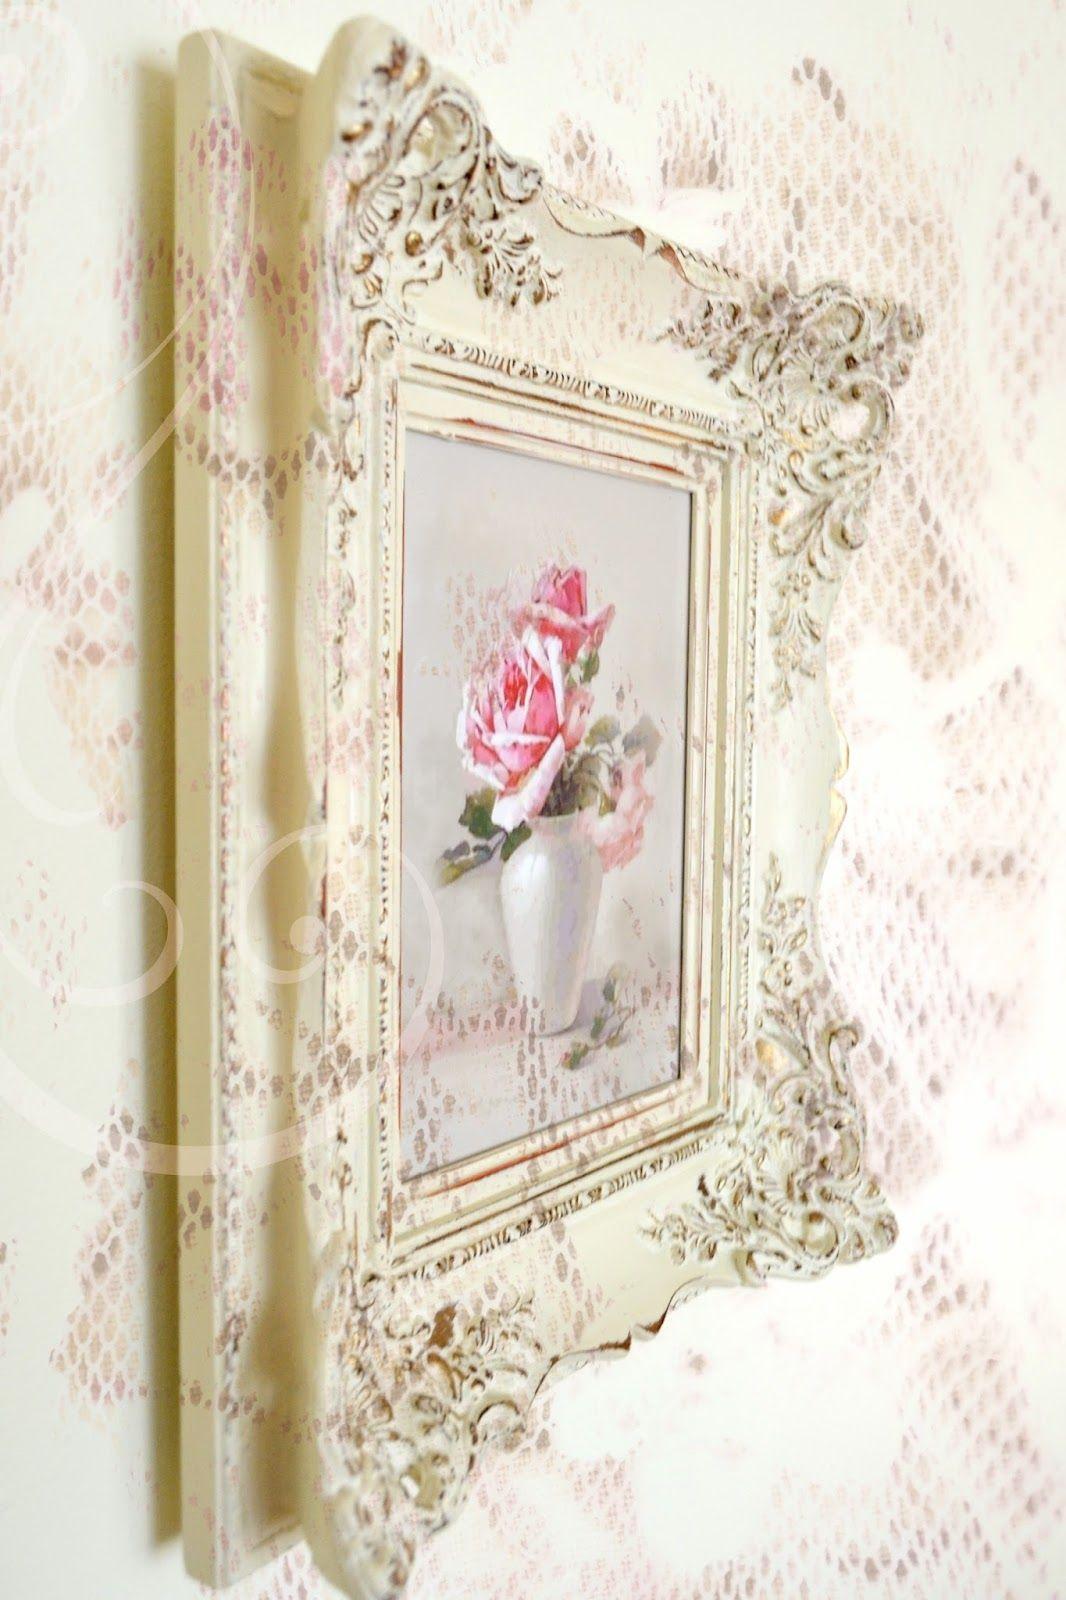 Jennelise rose blog on pinterest 375 pins for Shabby chic blog italiani